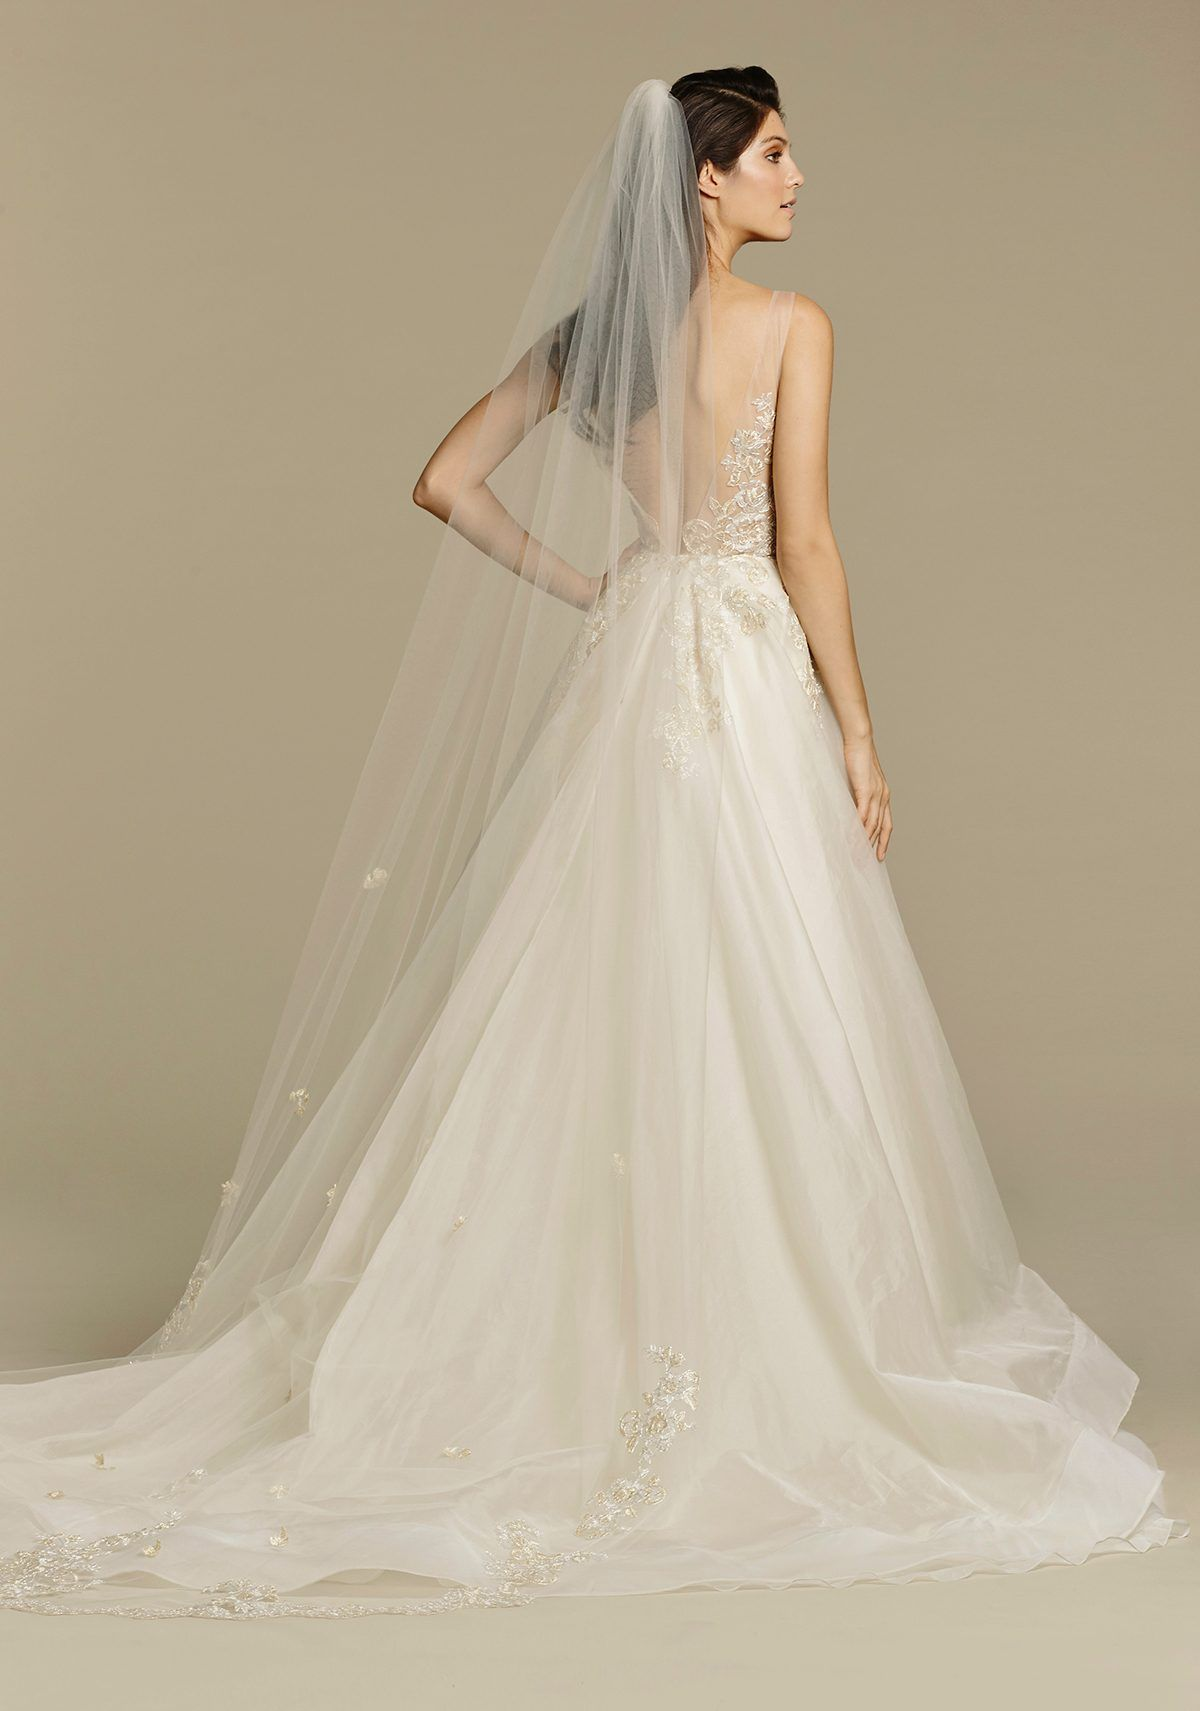 Style #2609 (back) by Tara Keely | Tara Keely | Pinterest